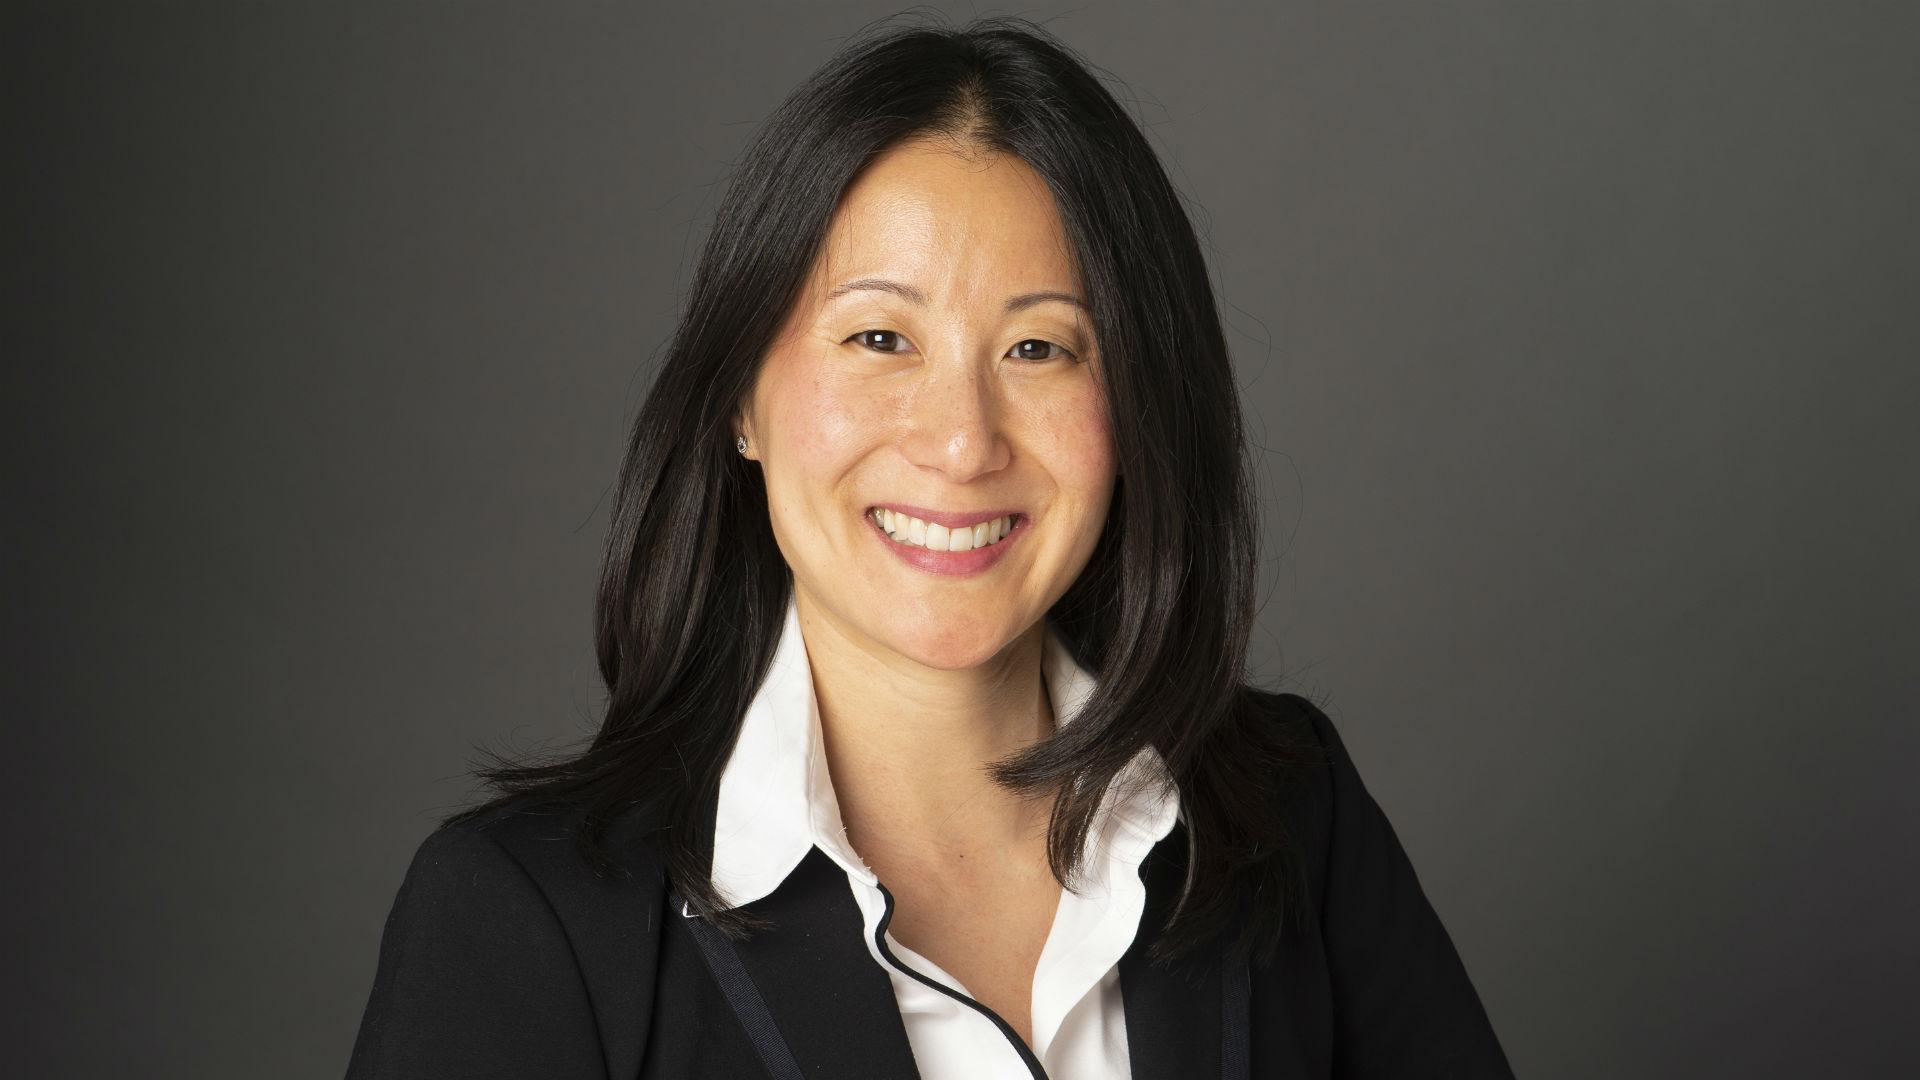 USA Gymnastics names NBA exec Li Li Leung as president, CEO